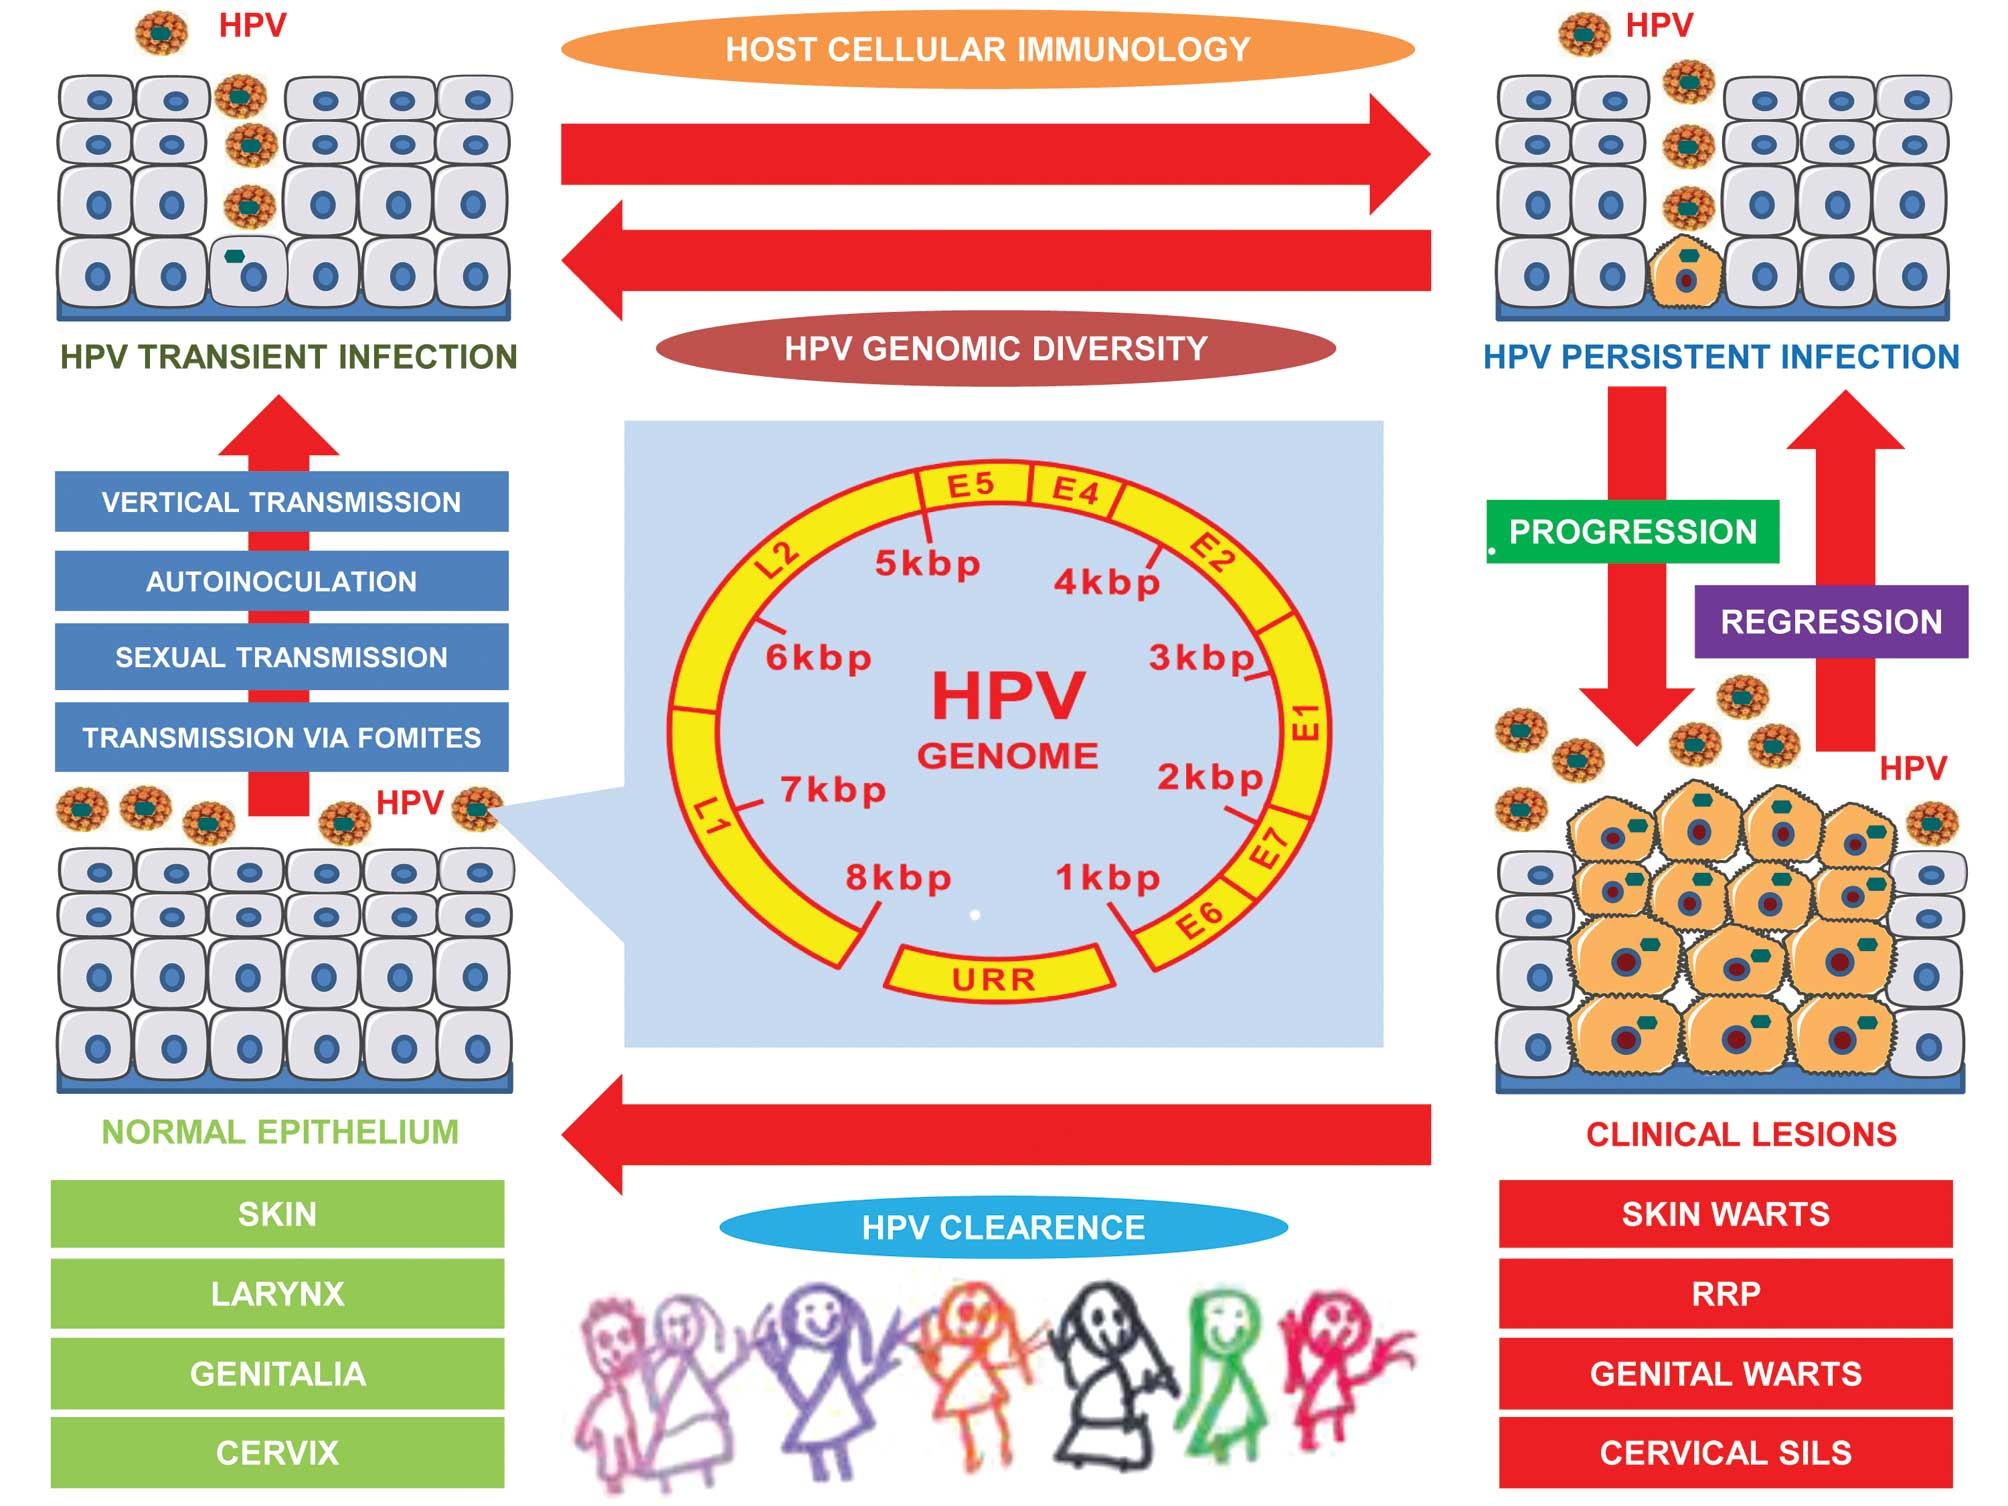 hpv human papillomavirus transmission